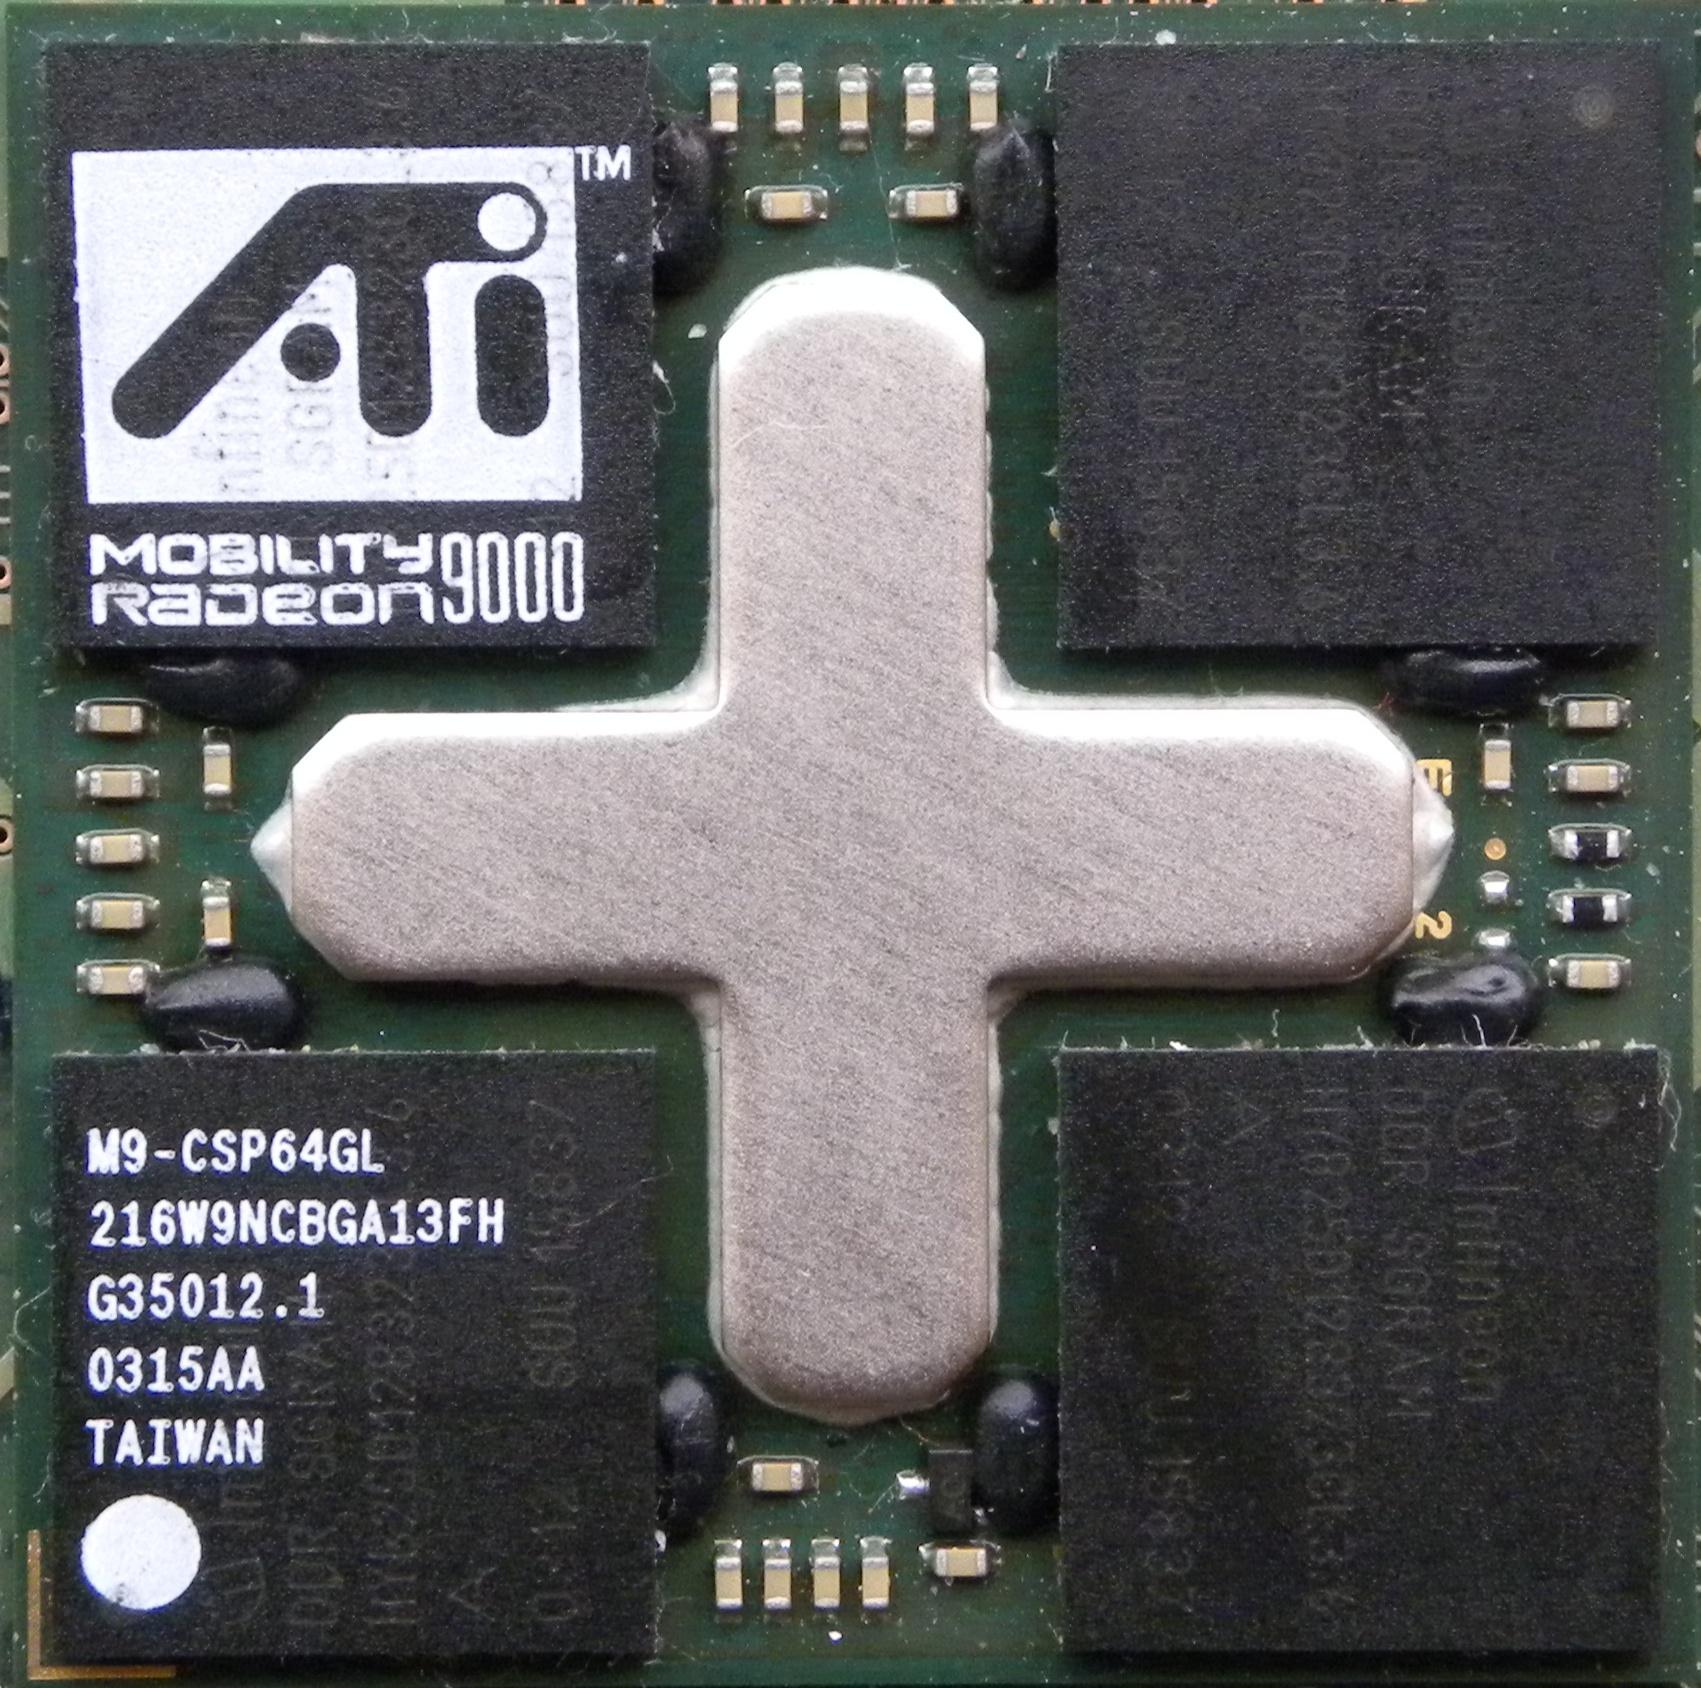 ATI Mobility Radeon 9000, obrázek 1